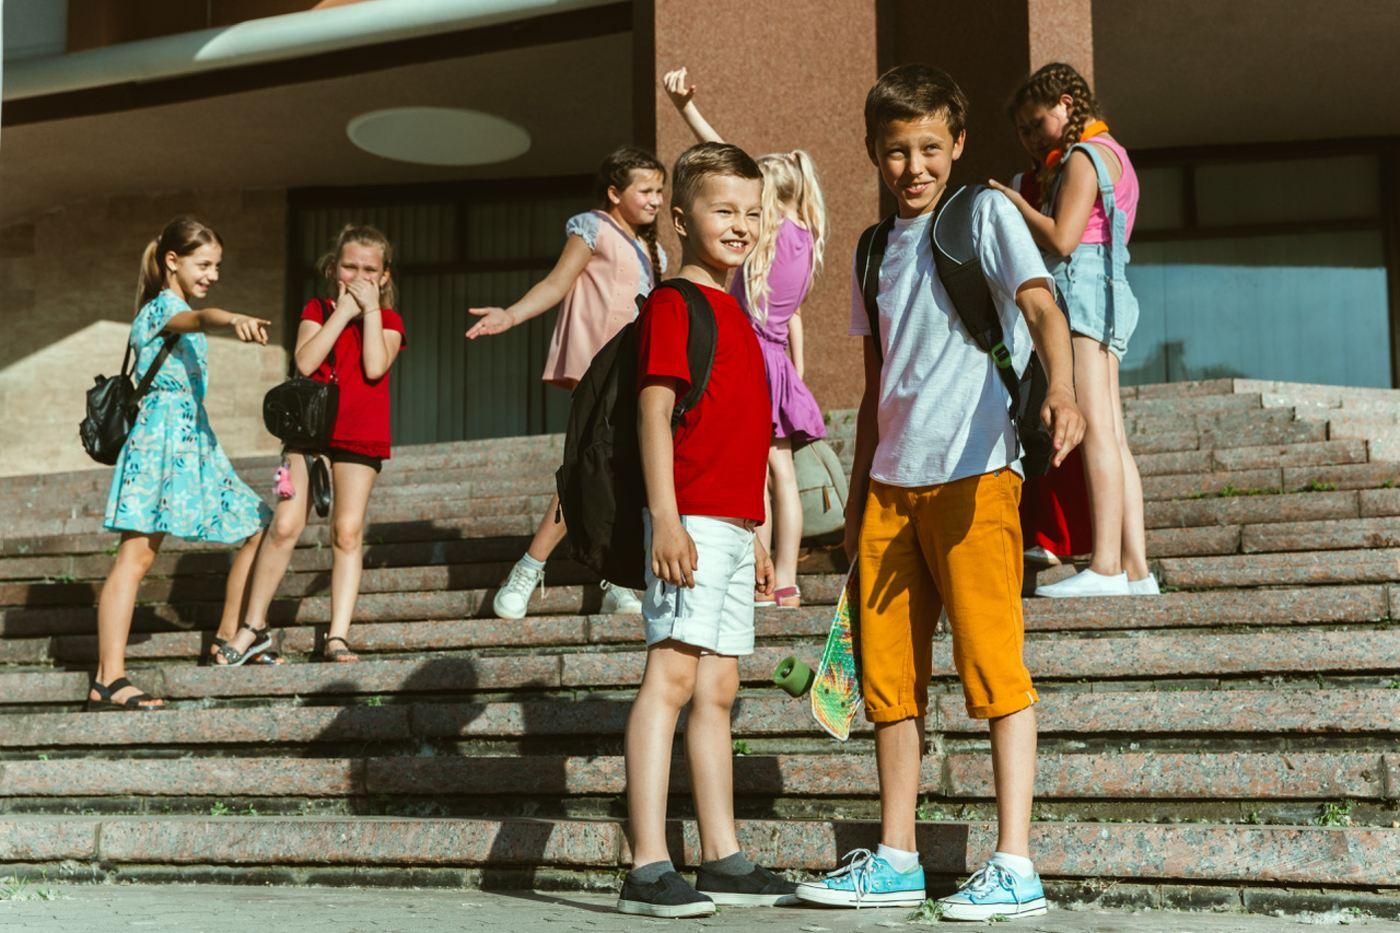 HHT-Children-Teenagers-1400